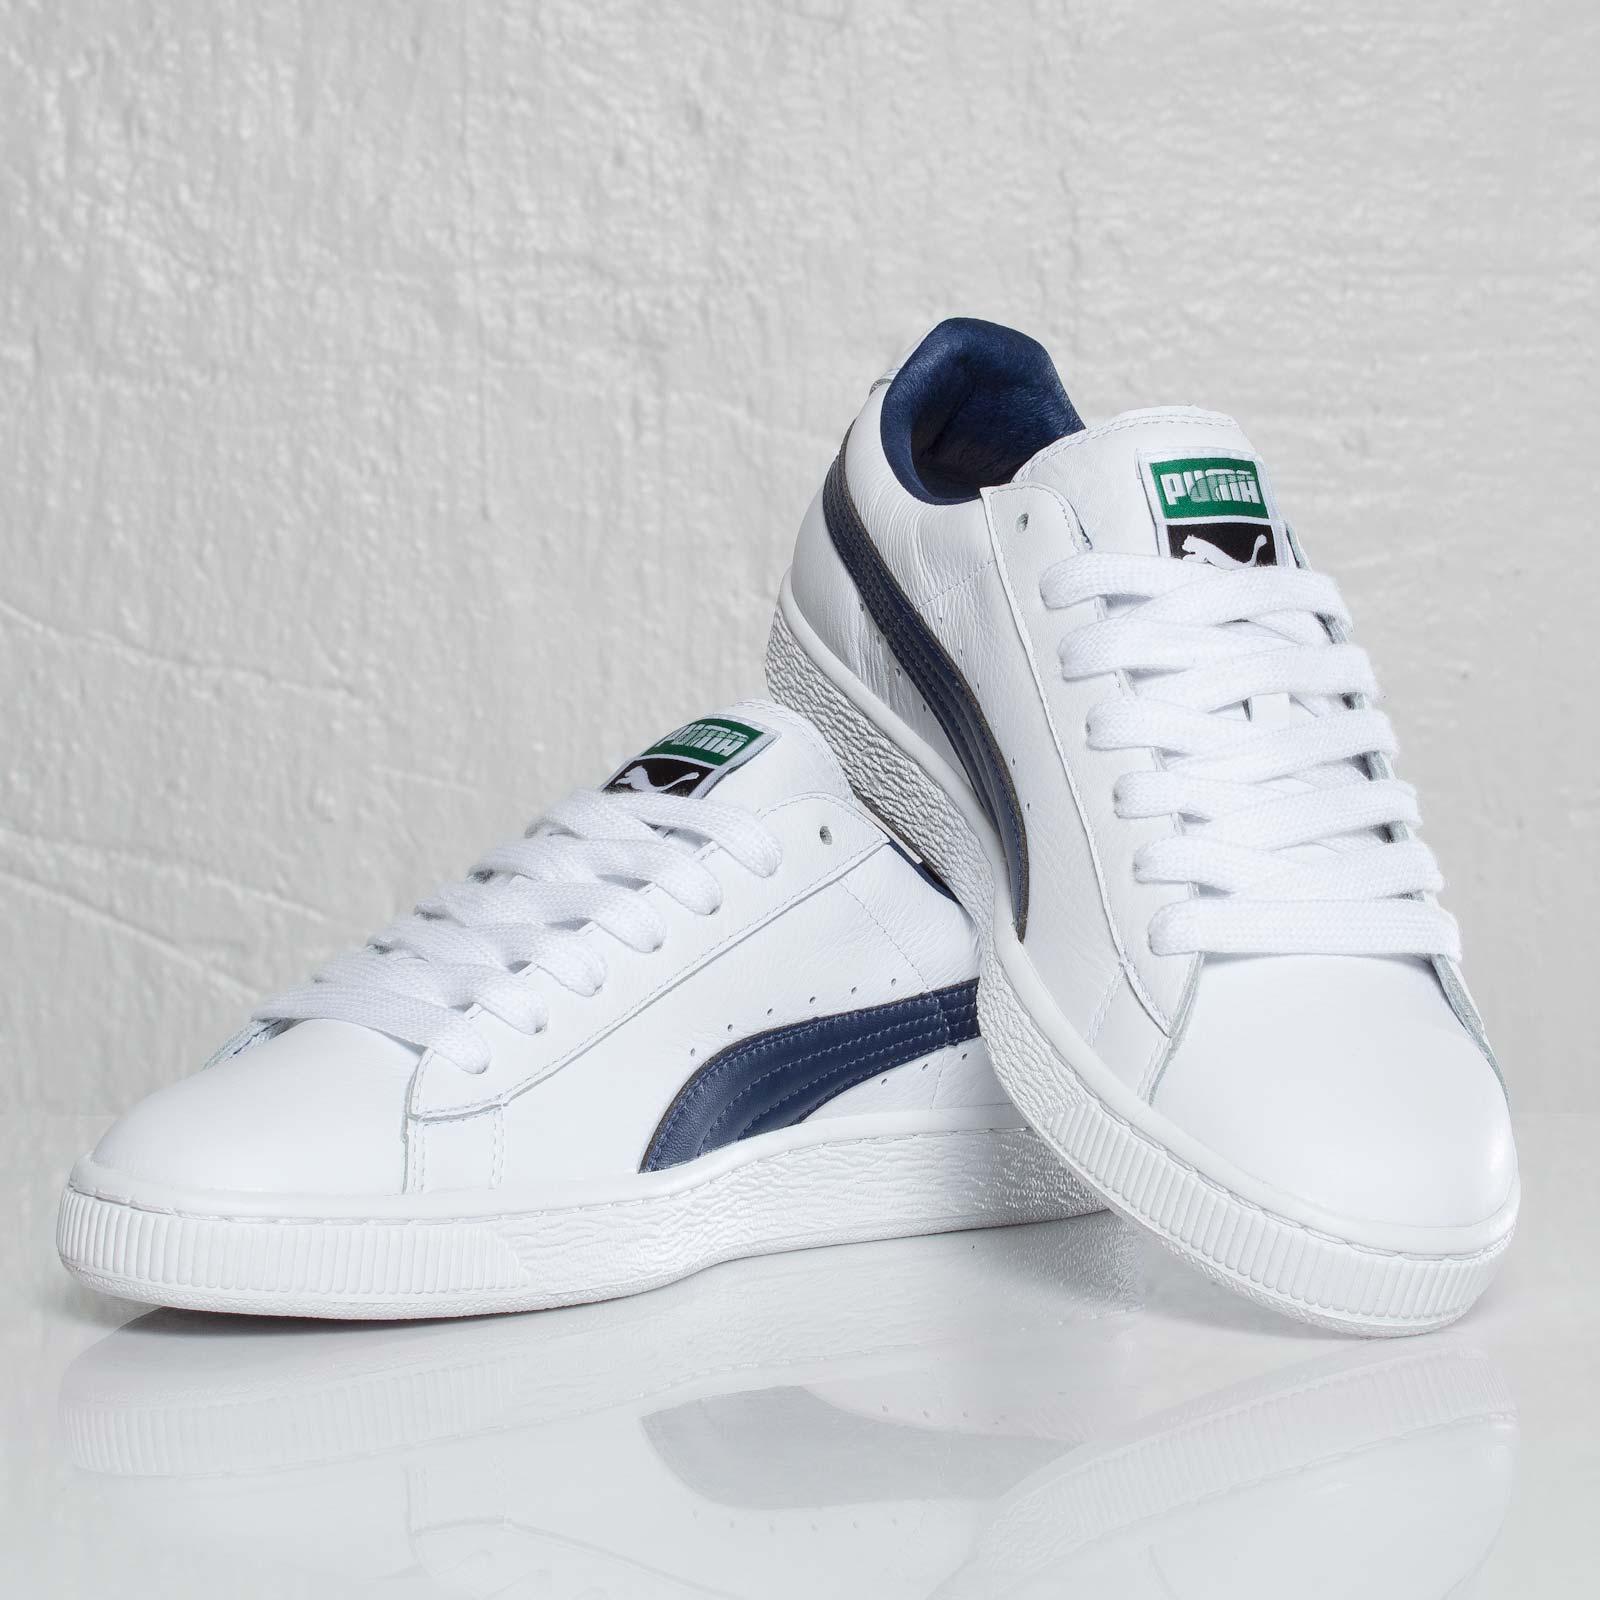 Basket Lfs SneakersnstuffSneakers Classic Puma 110577 XikOZPu